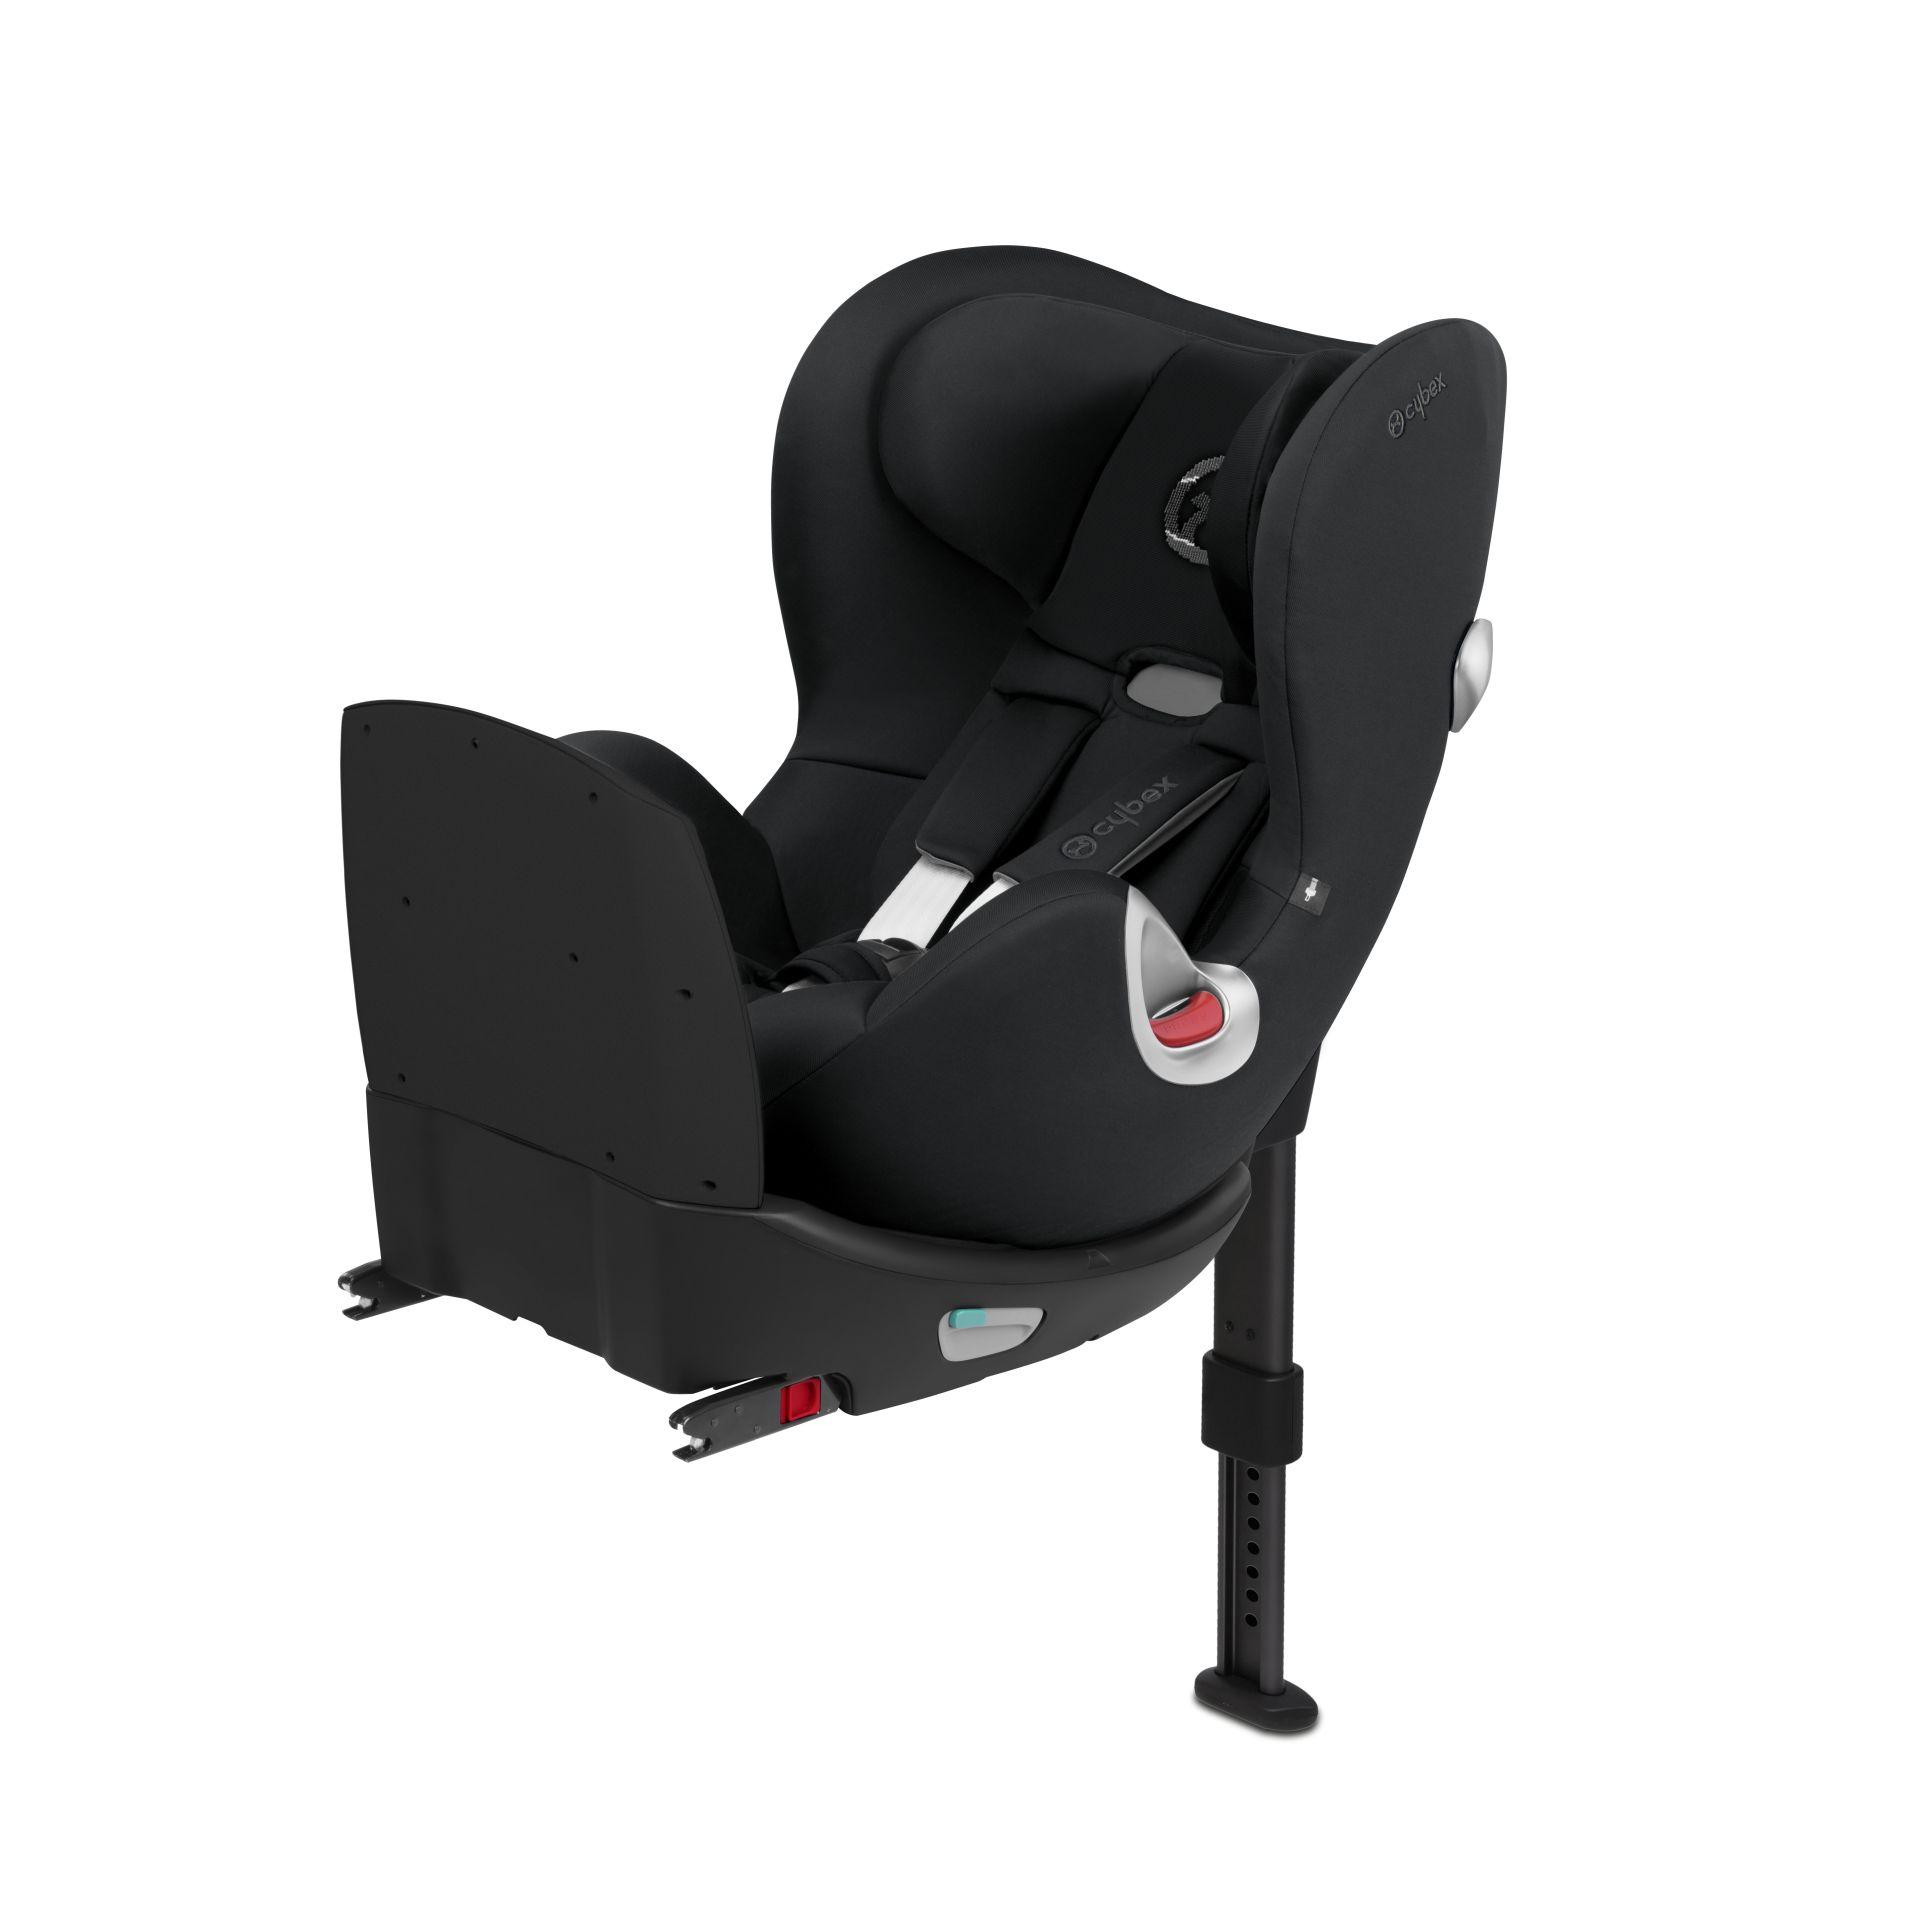 cybex platinum child car seat sirona q i size 2018 stardust black black buy at kidsroom. Black Bedroom Furniture Sets. Home Design Ideas